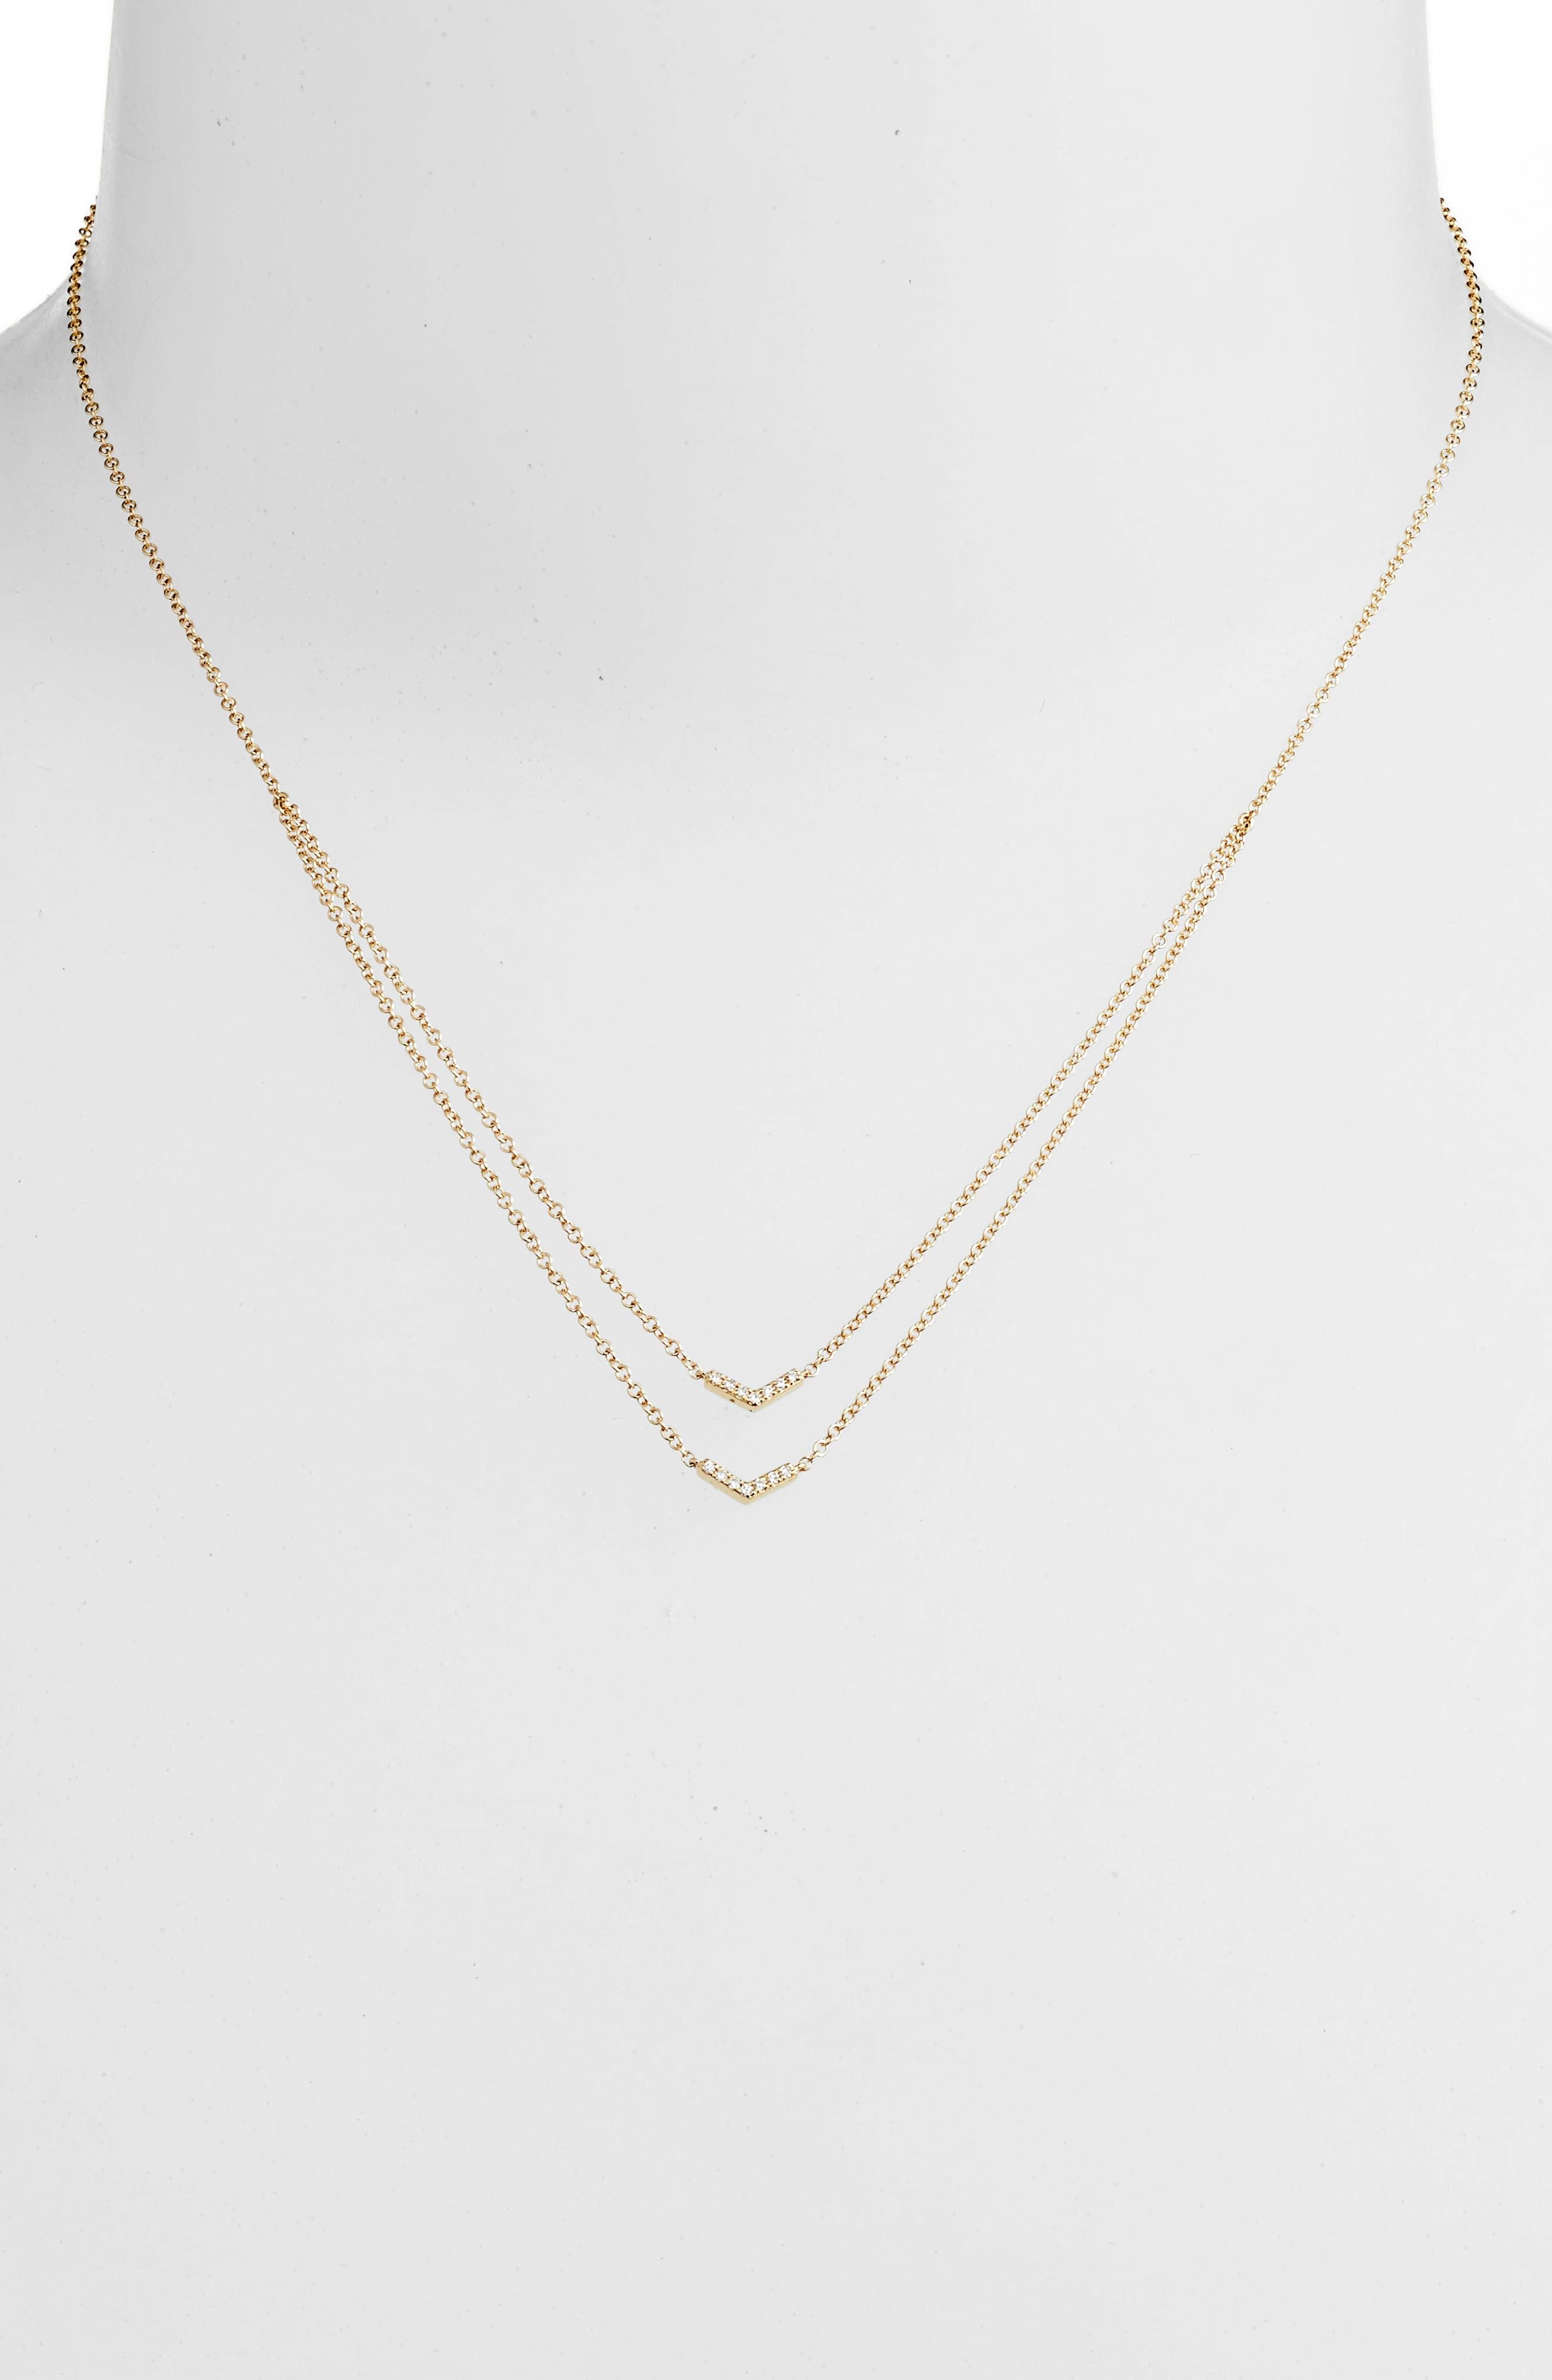 Double Row Chevron Diamond Necklace,                             Alternate thumbnail 2, color,                             YELLOW GOLD